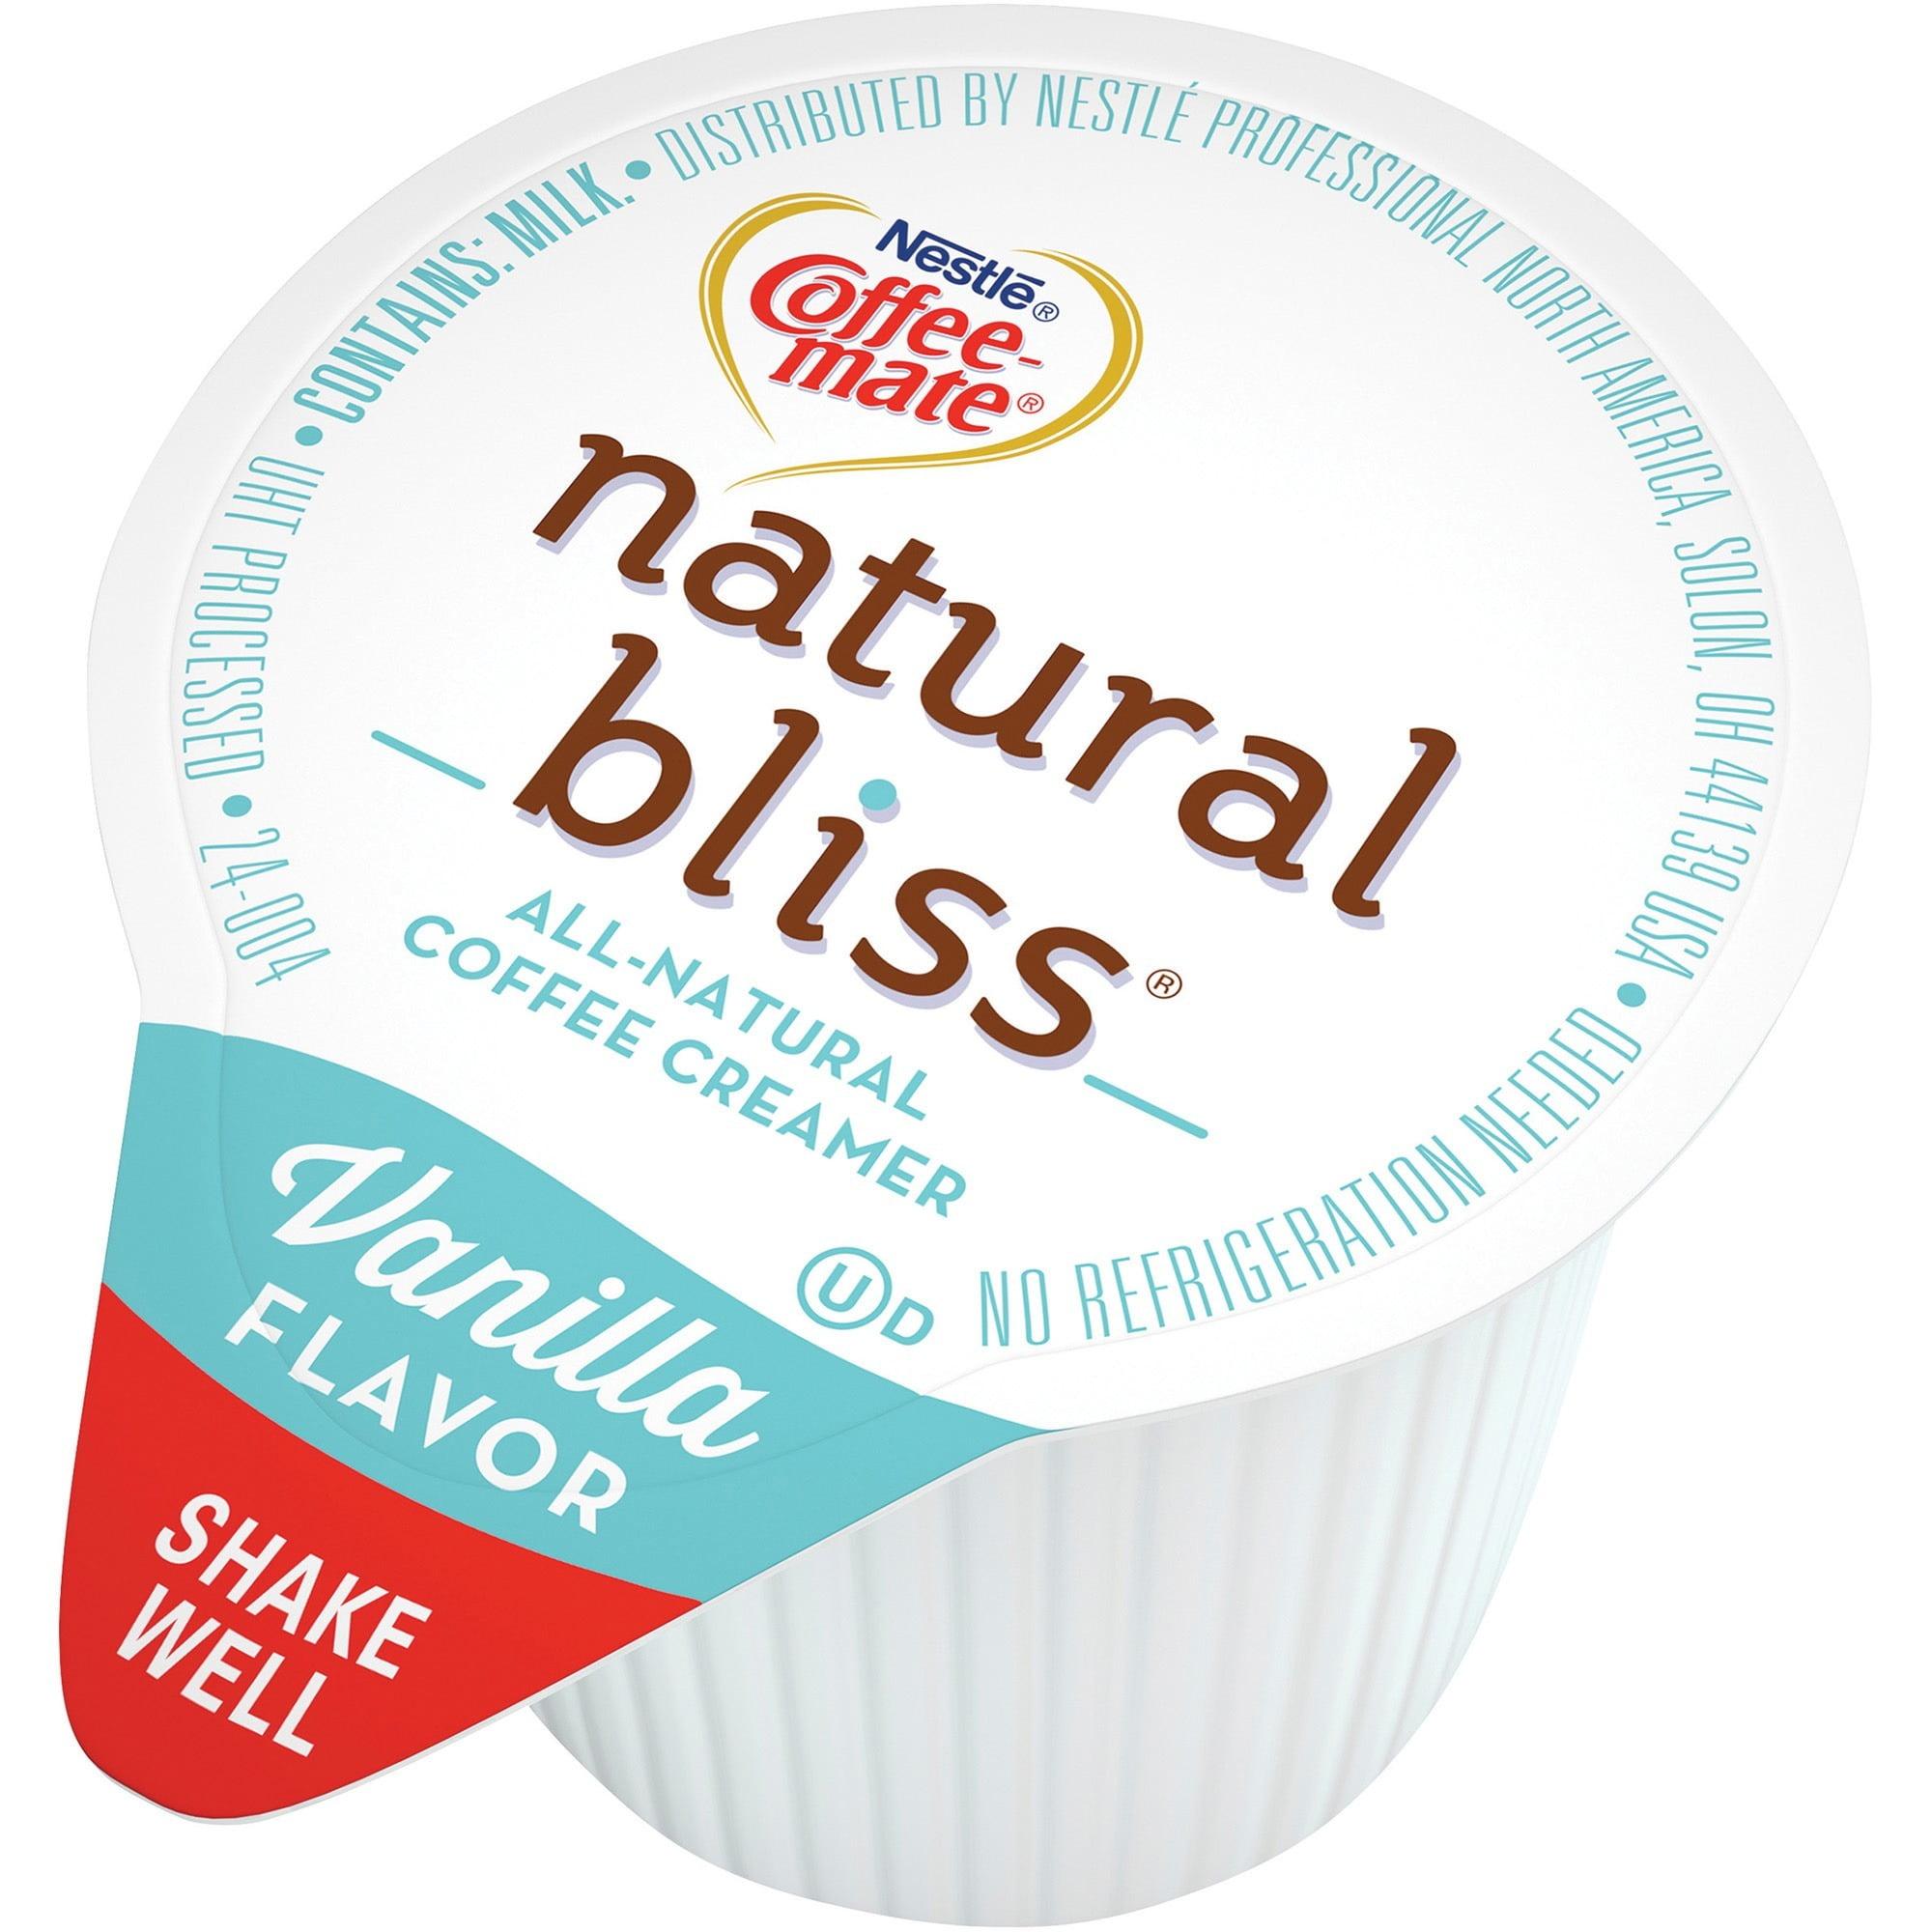 Nestlé Coffee-mate Vanilla Natural Bliss 180 ct box creamers